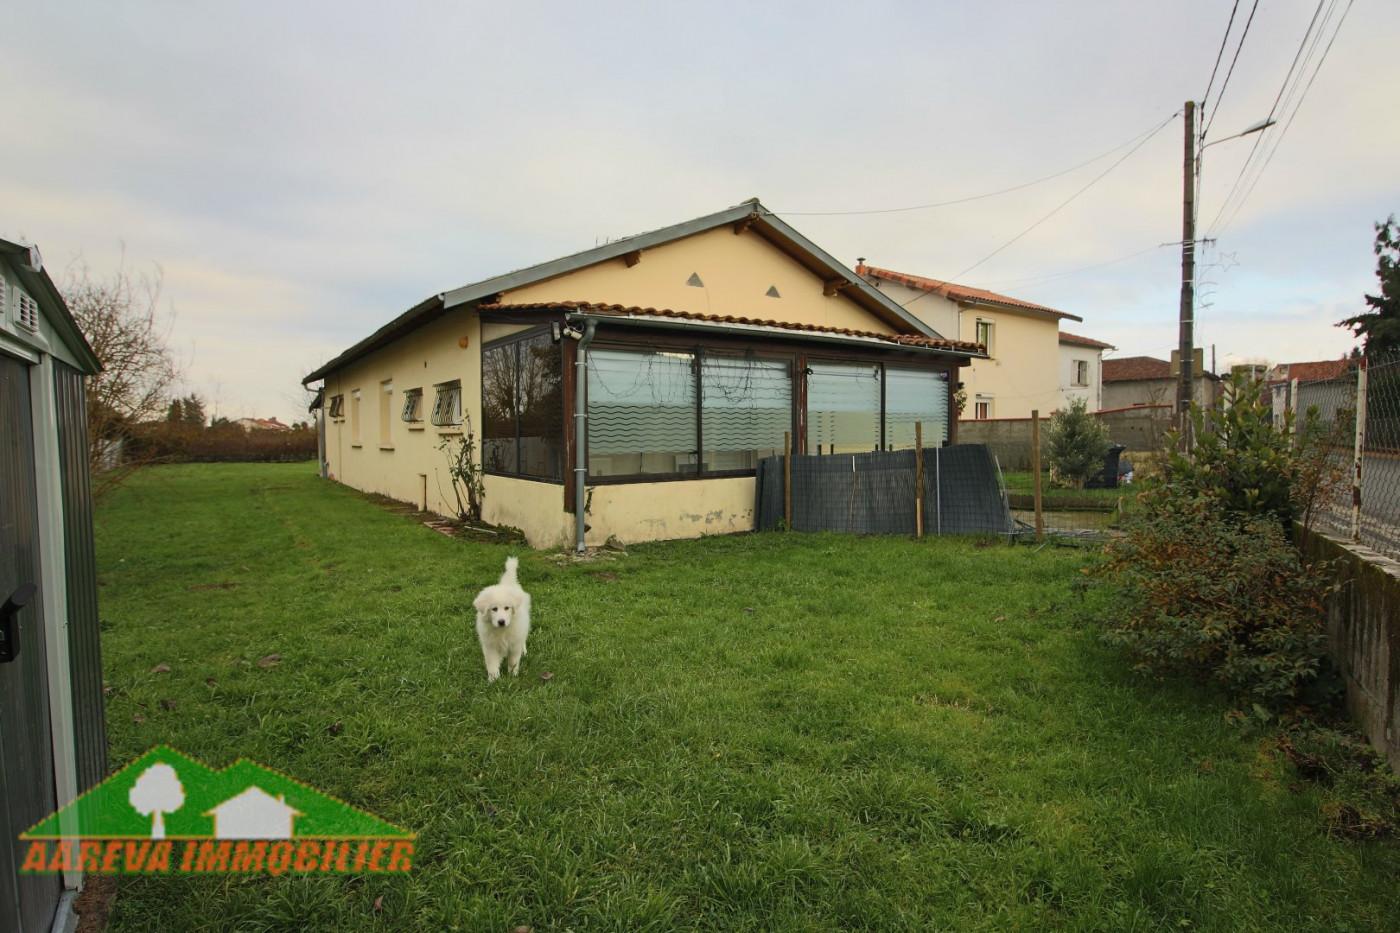 A vendre  Labarthe Riviere   Réf 31158730 - Aareva immobilier